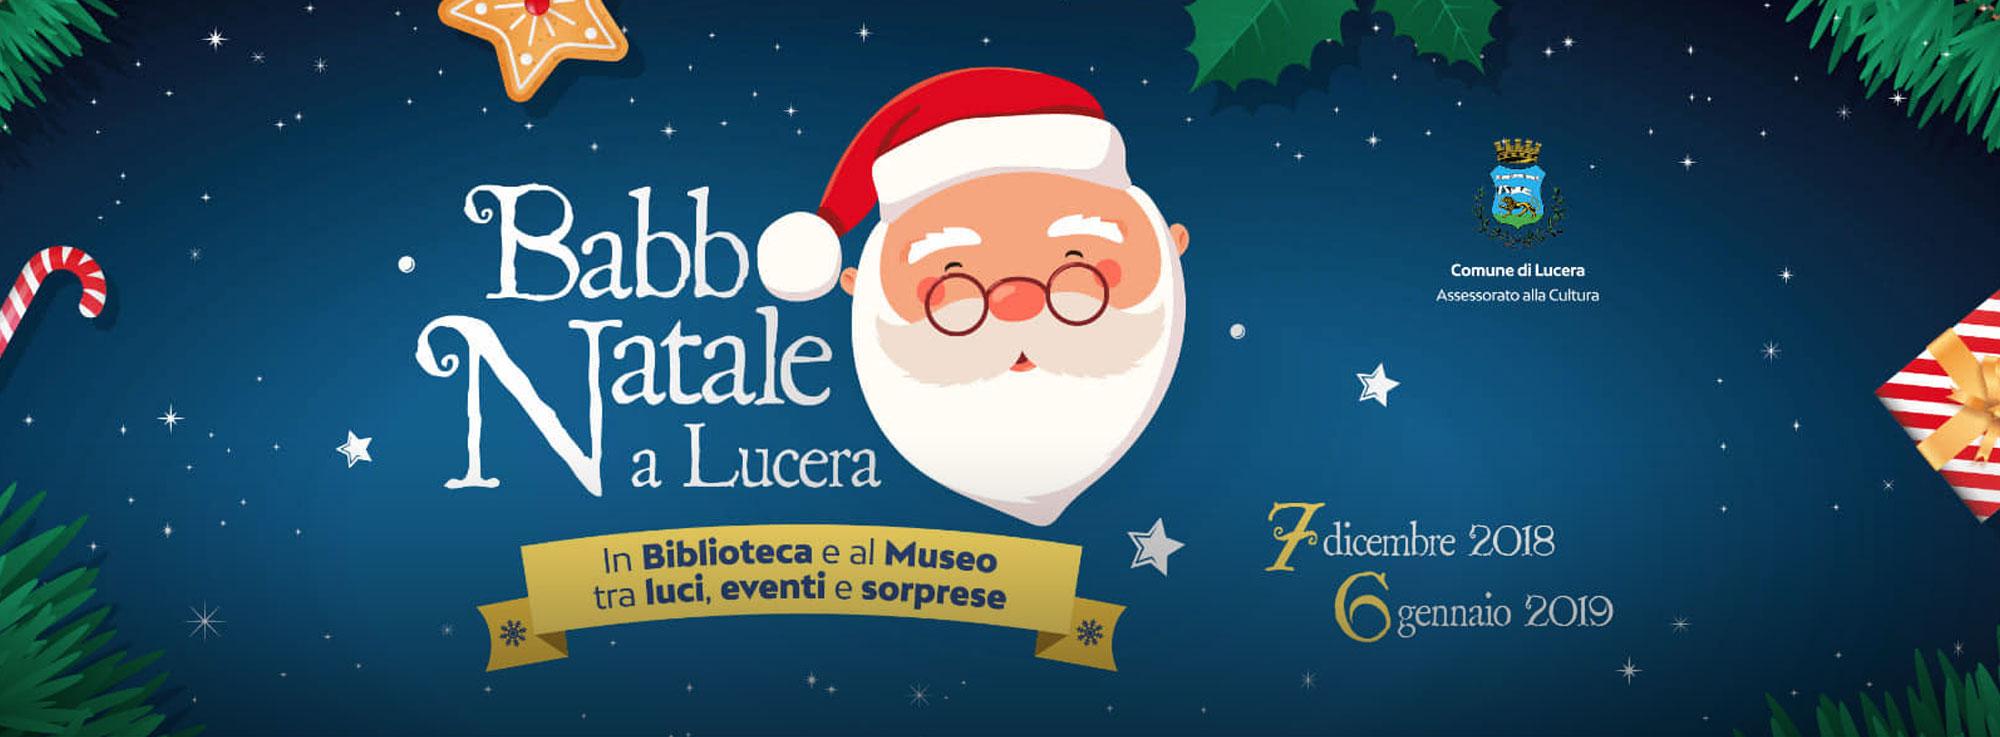 Lucera: Babbo Natale a Lucera